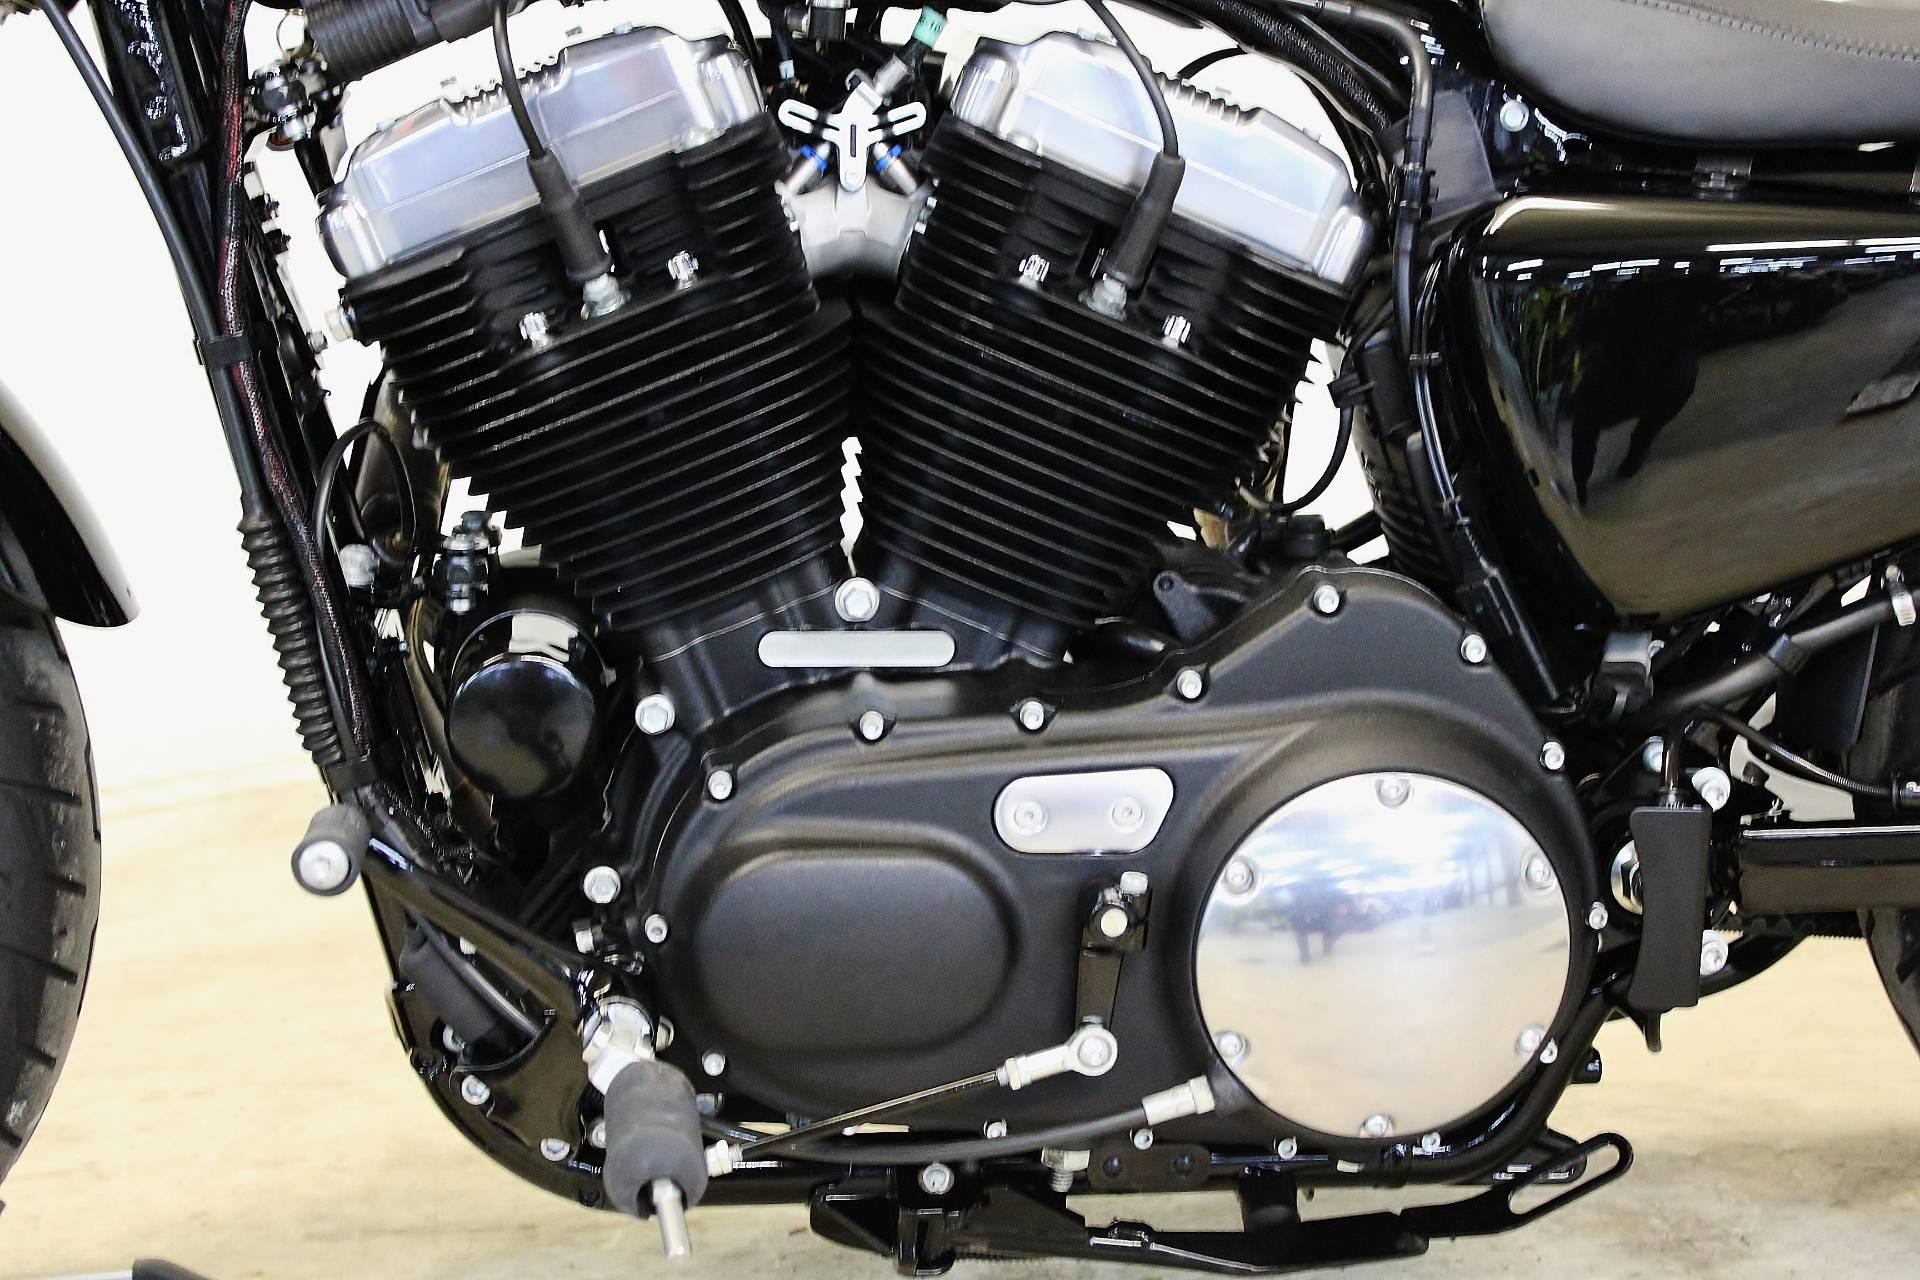 used 2015 harley davidson forty eight motorcycles in pittsfield ma rh ronniesharleydavidson com